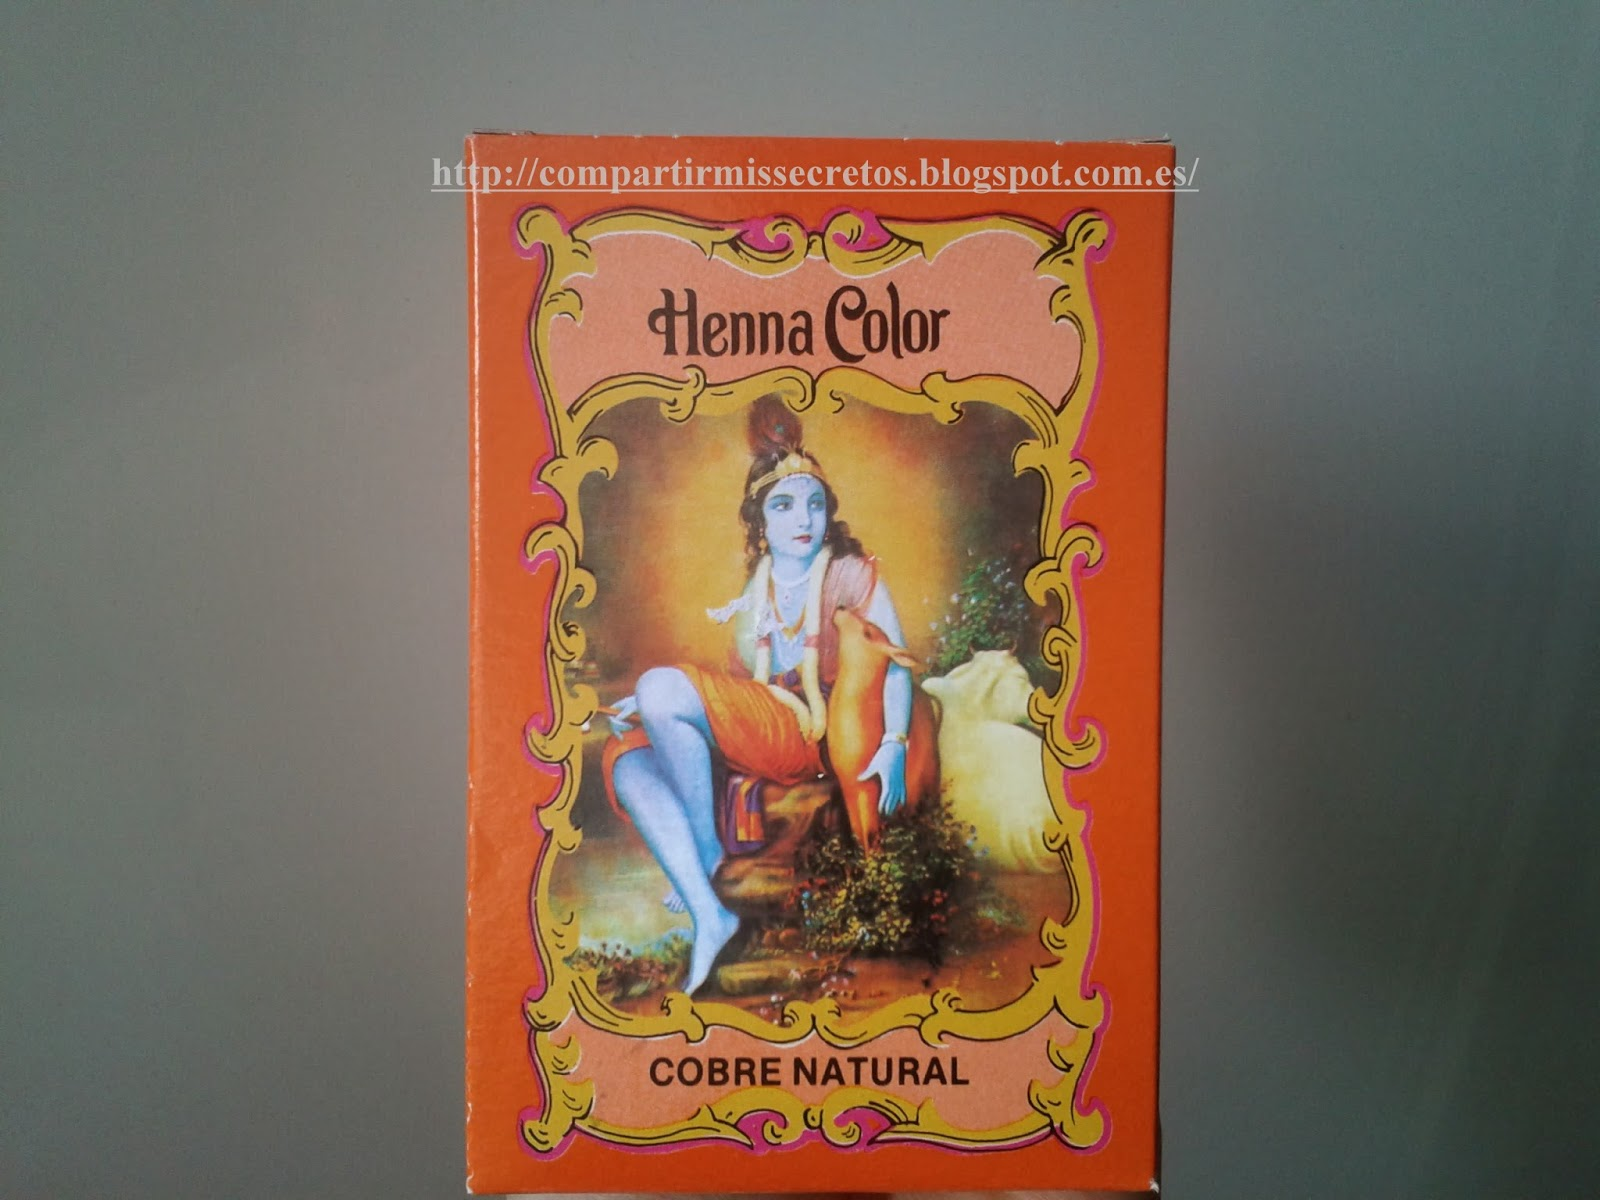 Compartir Mis Secretos Henna En Polvo Radhe Shyam